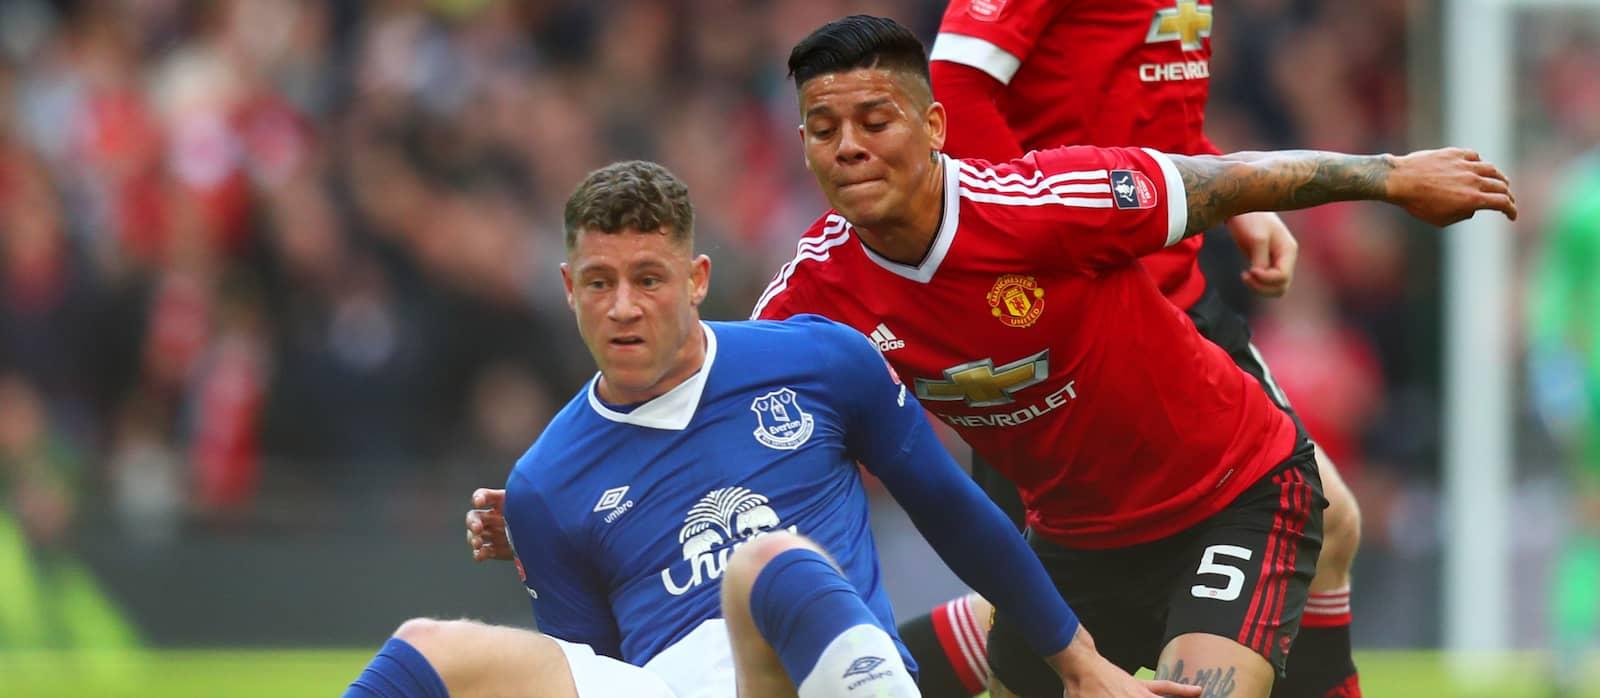 Man United vs Bournemouth: Full match-day squad